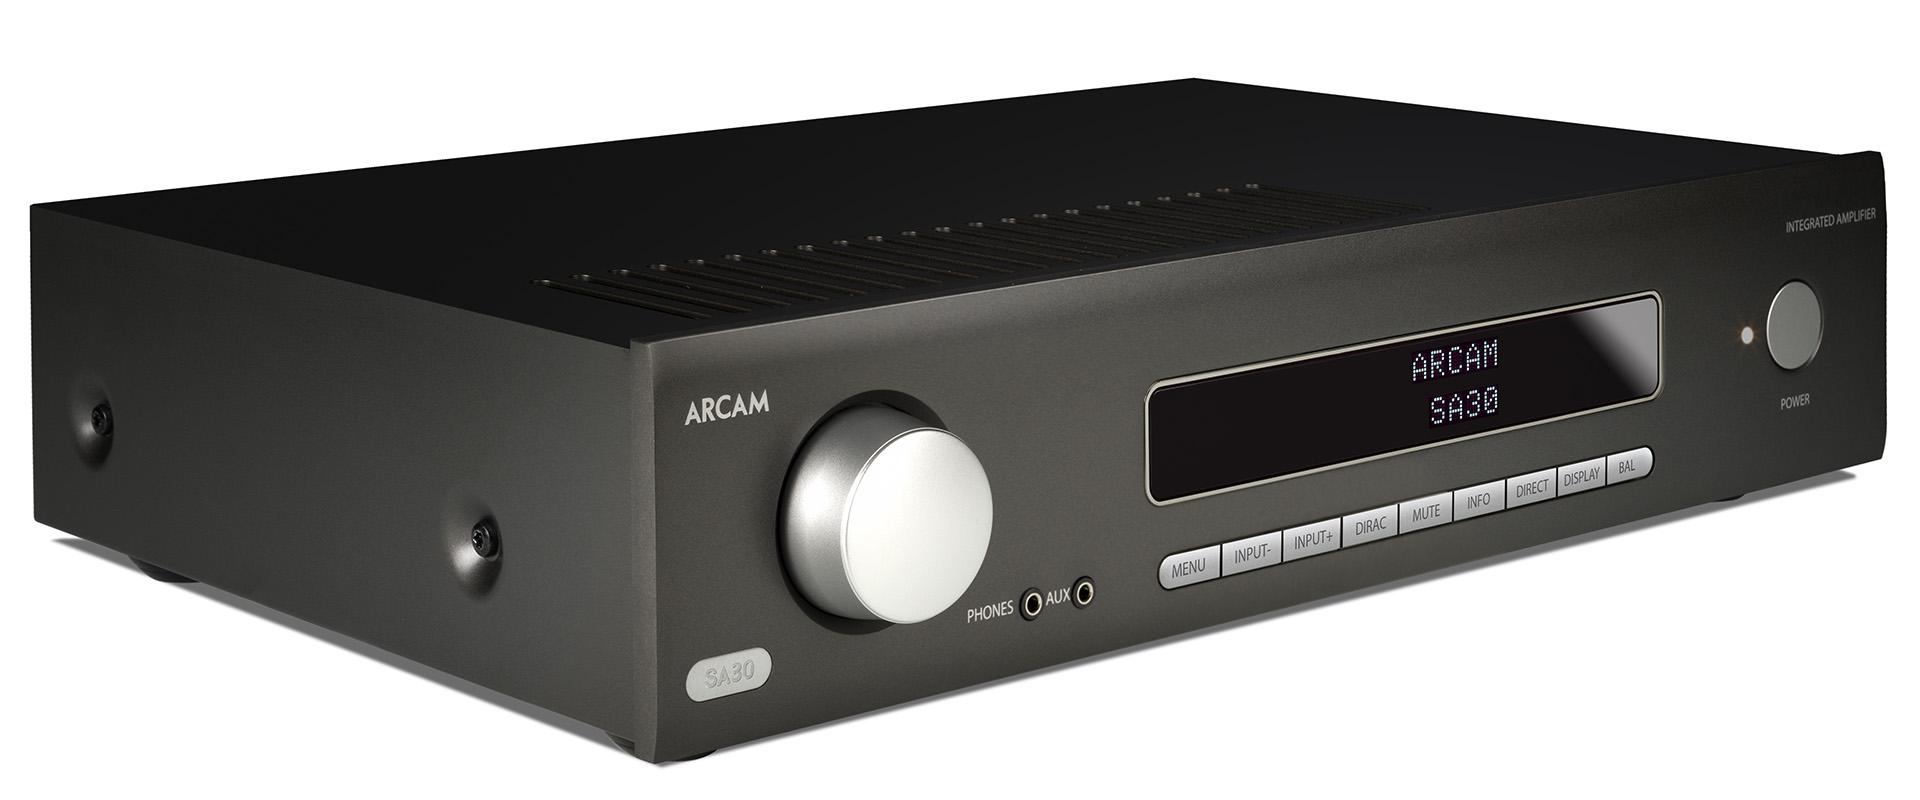 Arcam SA30 получает «пять звёзд» от What Hi-Fi?